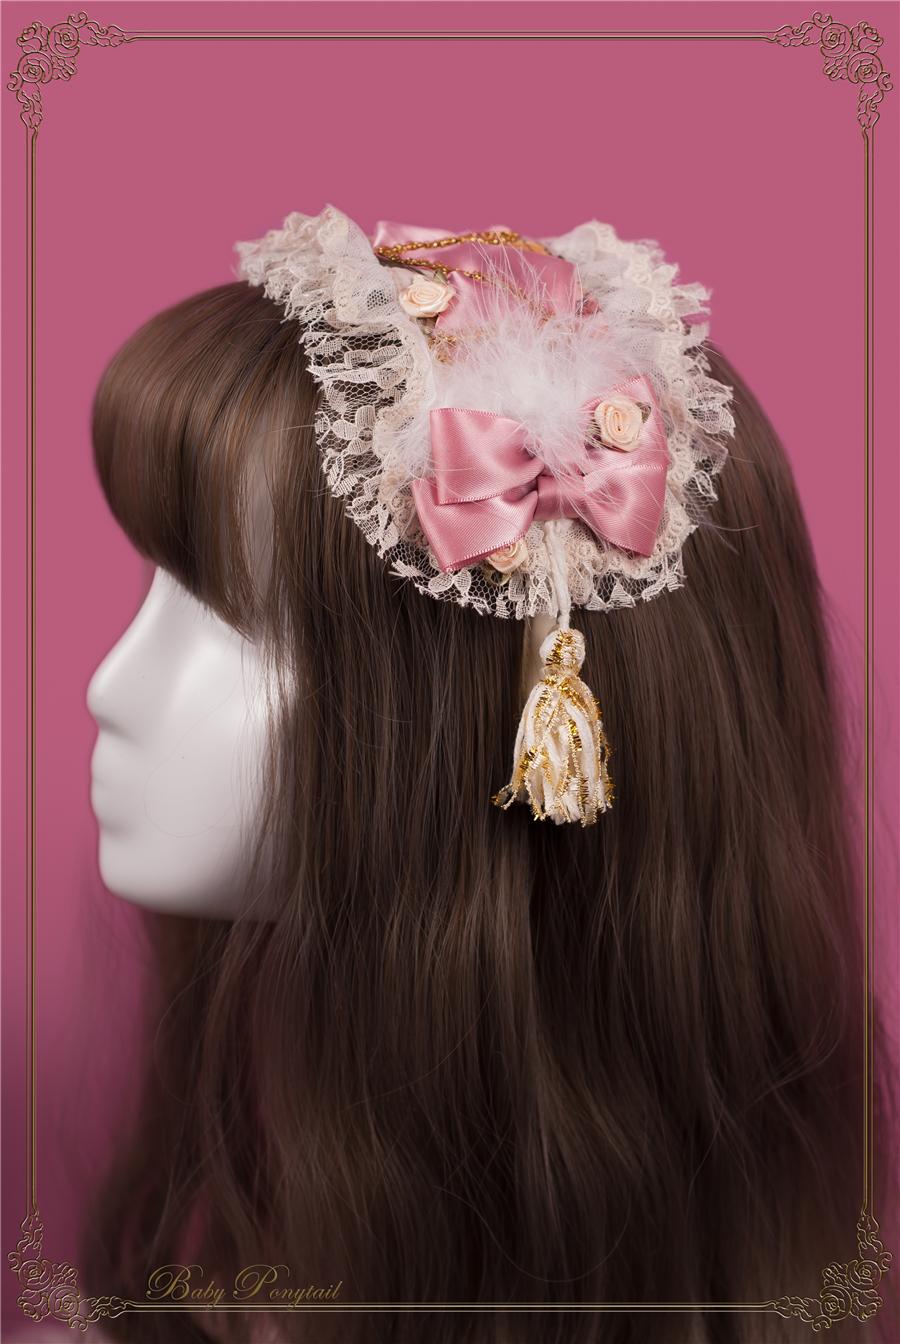 Babyponytail_Accessory_Tassel Head Dress_4.jpg